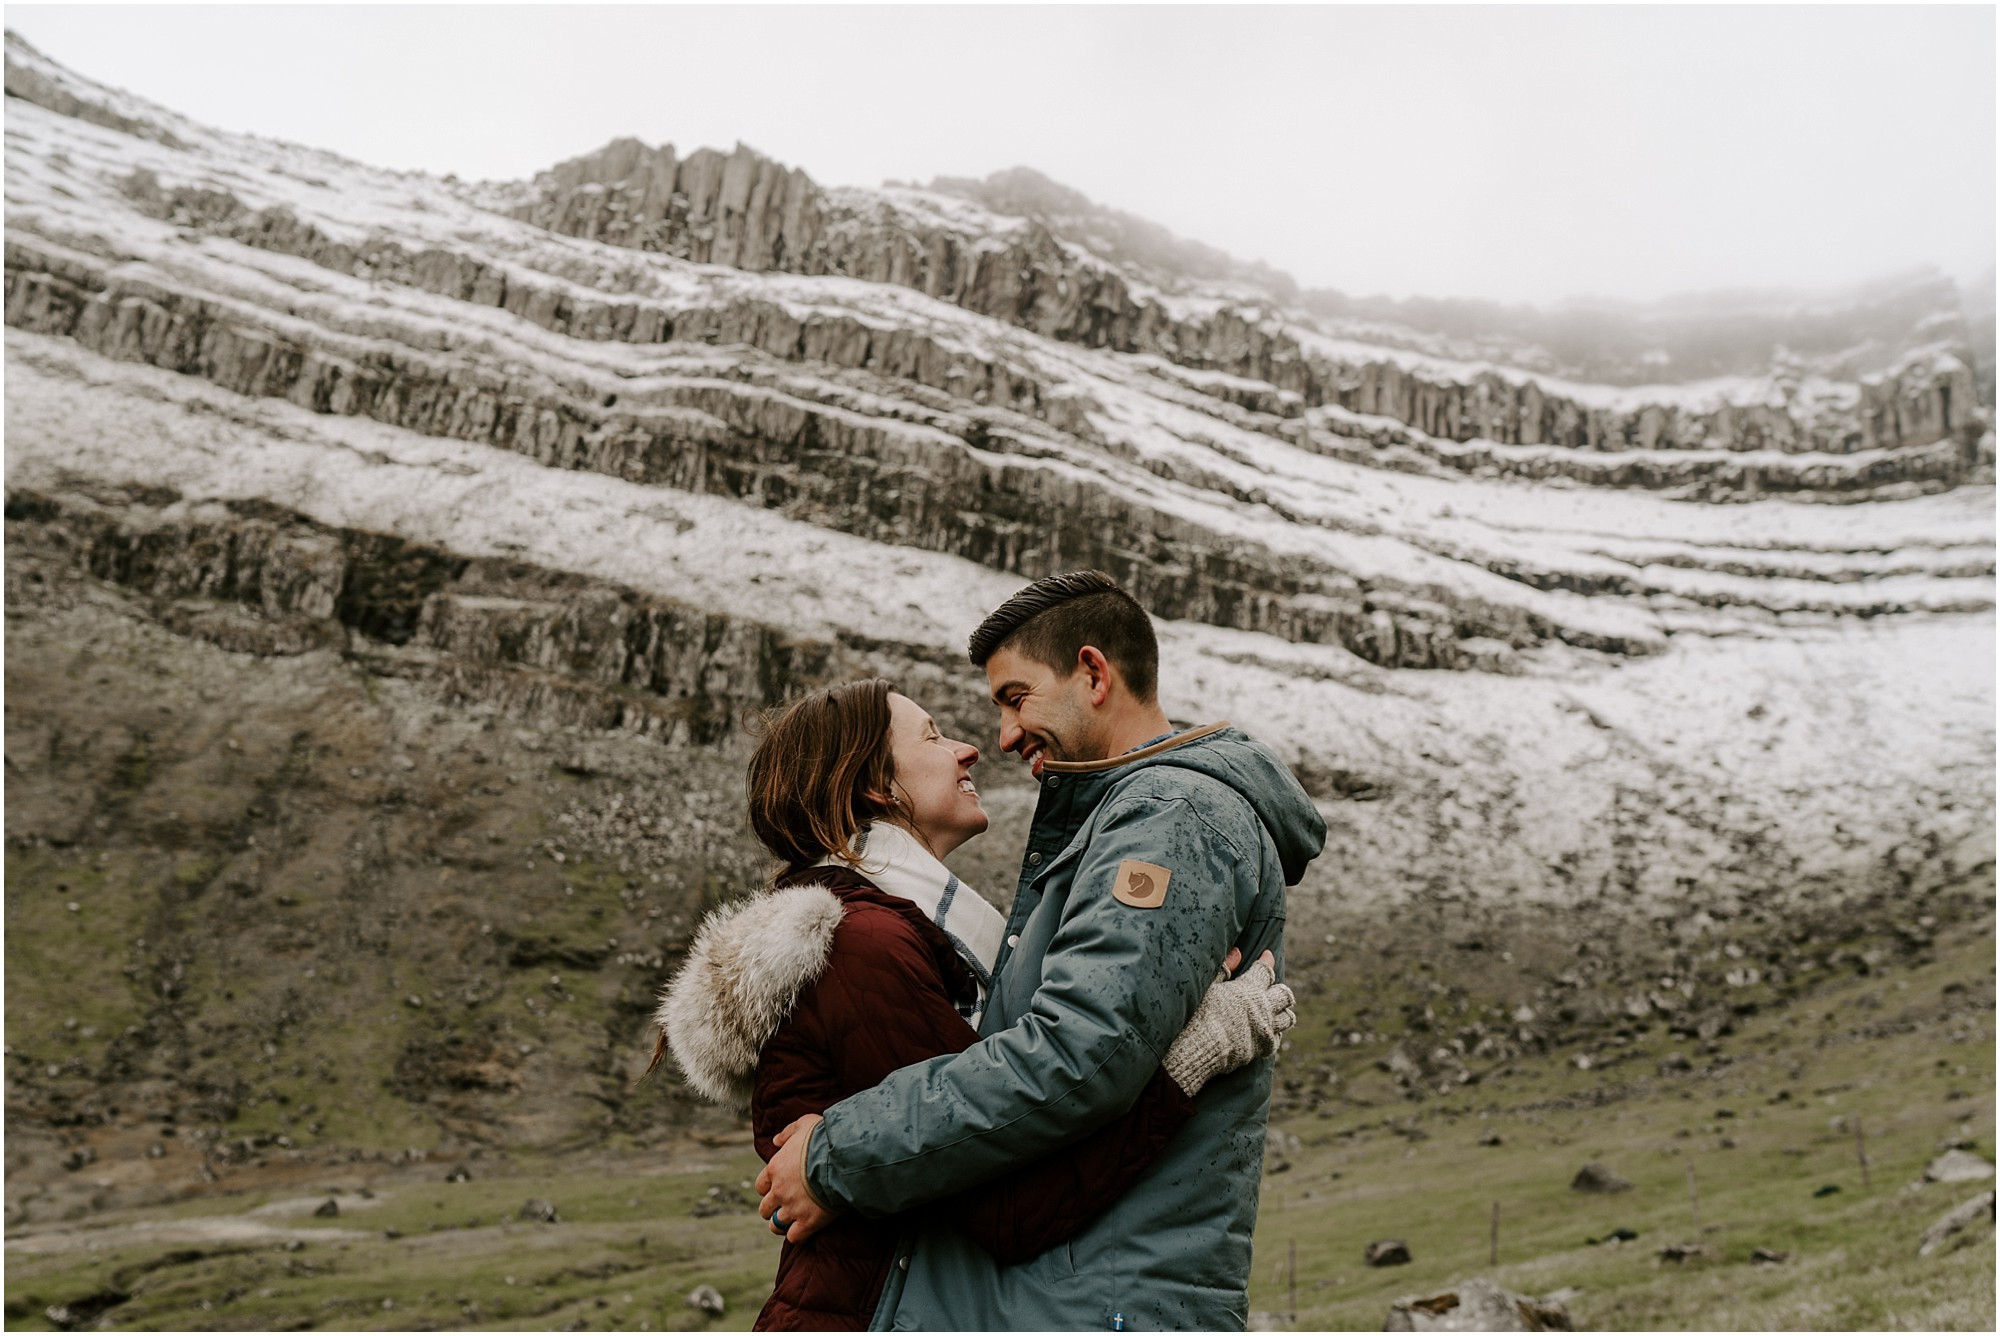 faroe-islands-engagement-session-destination-elopement-photographer_0012.jpg